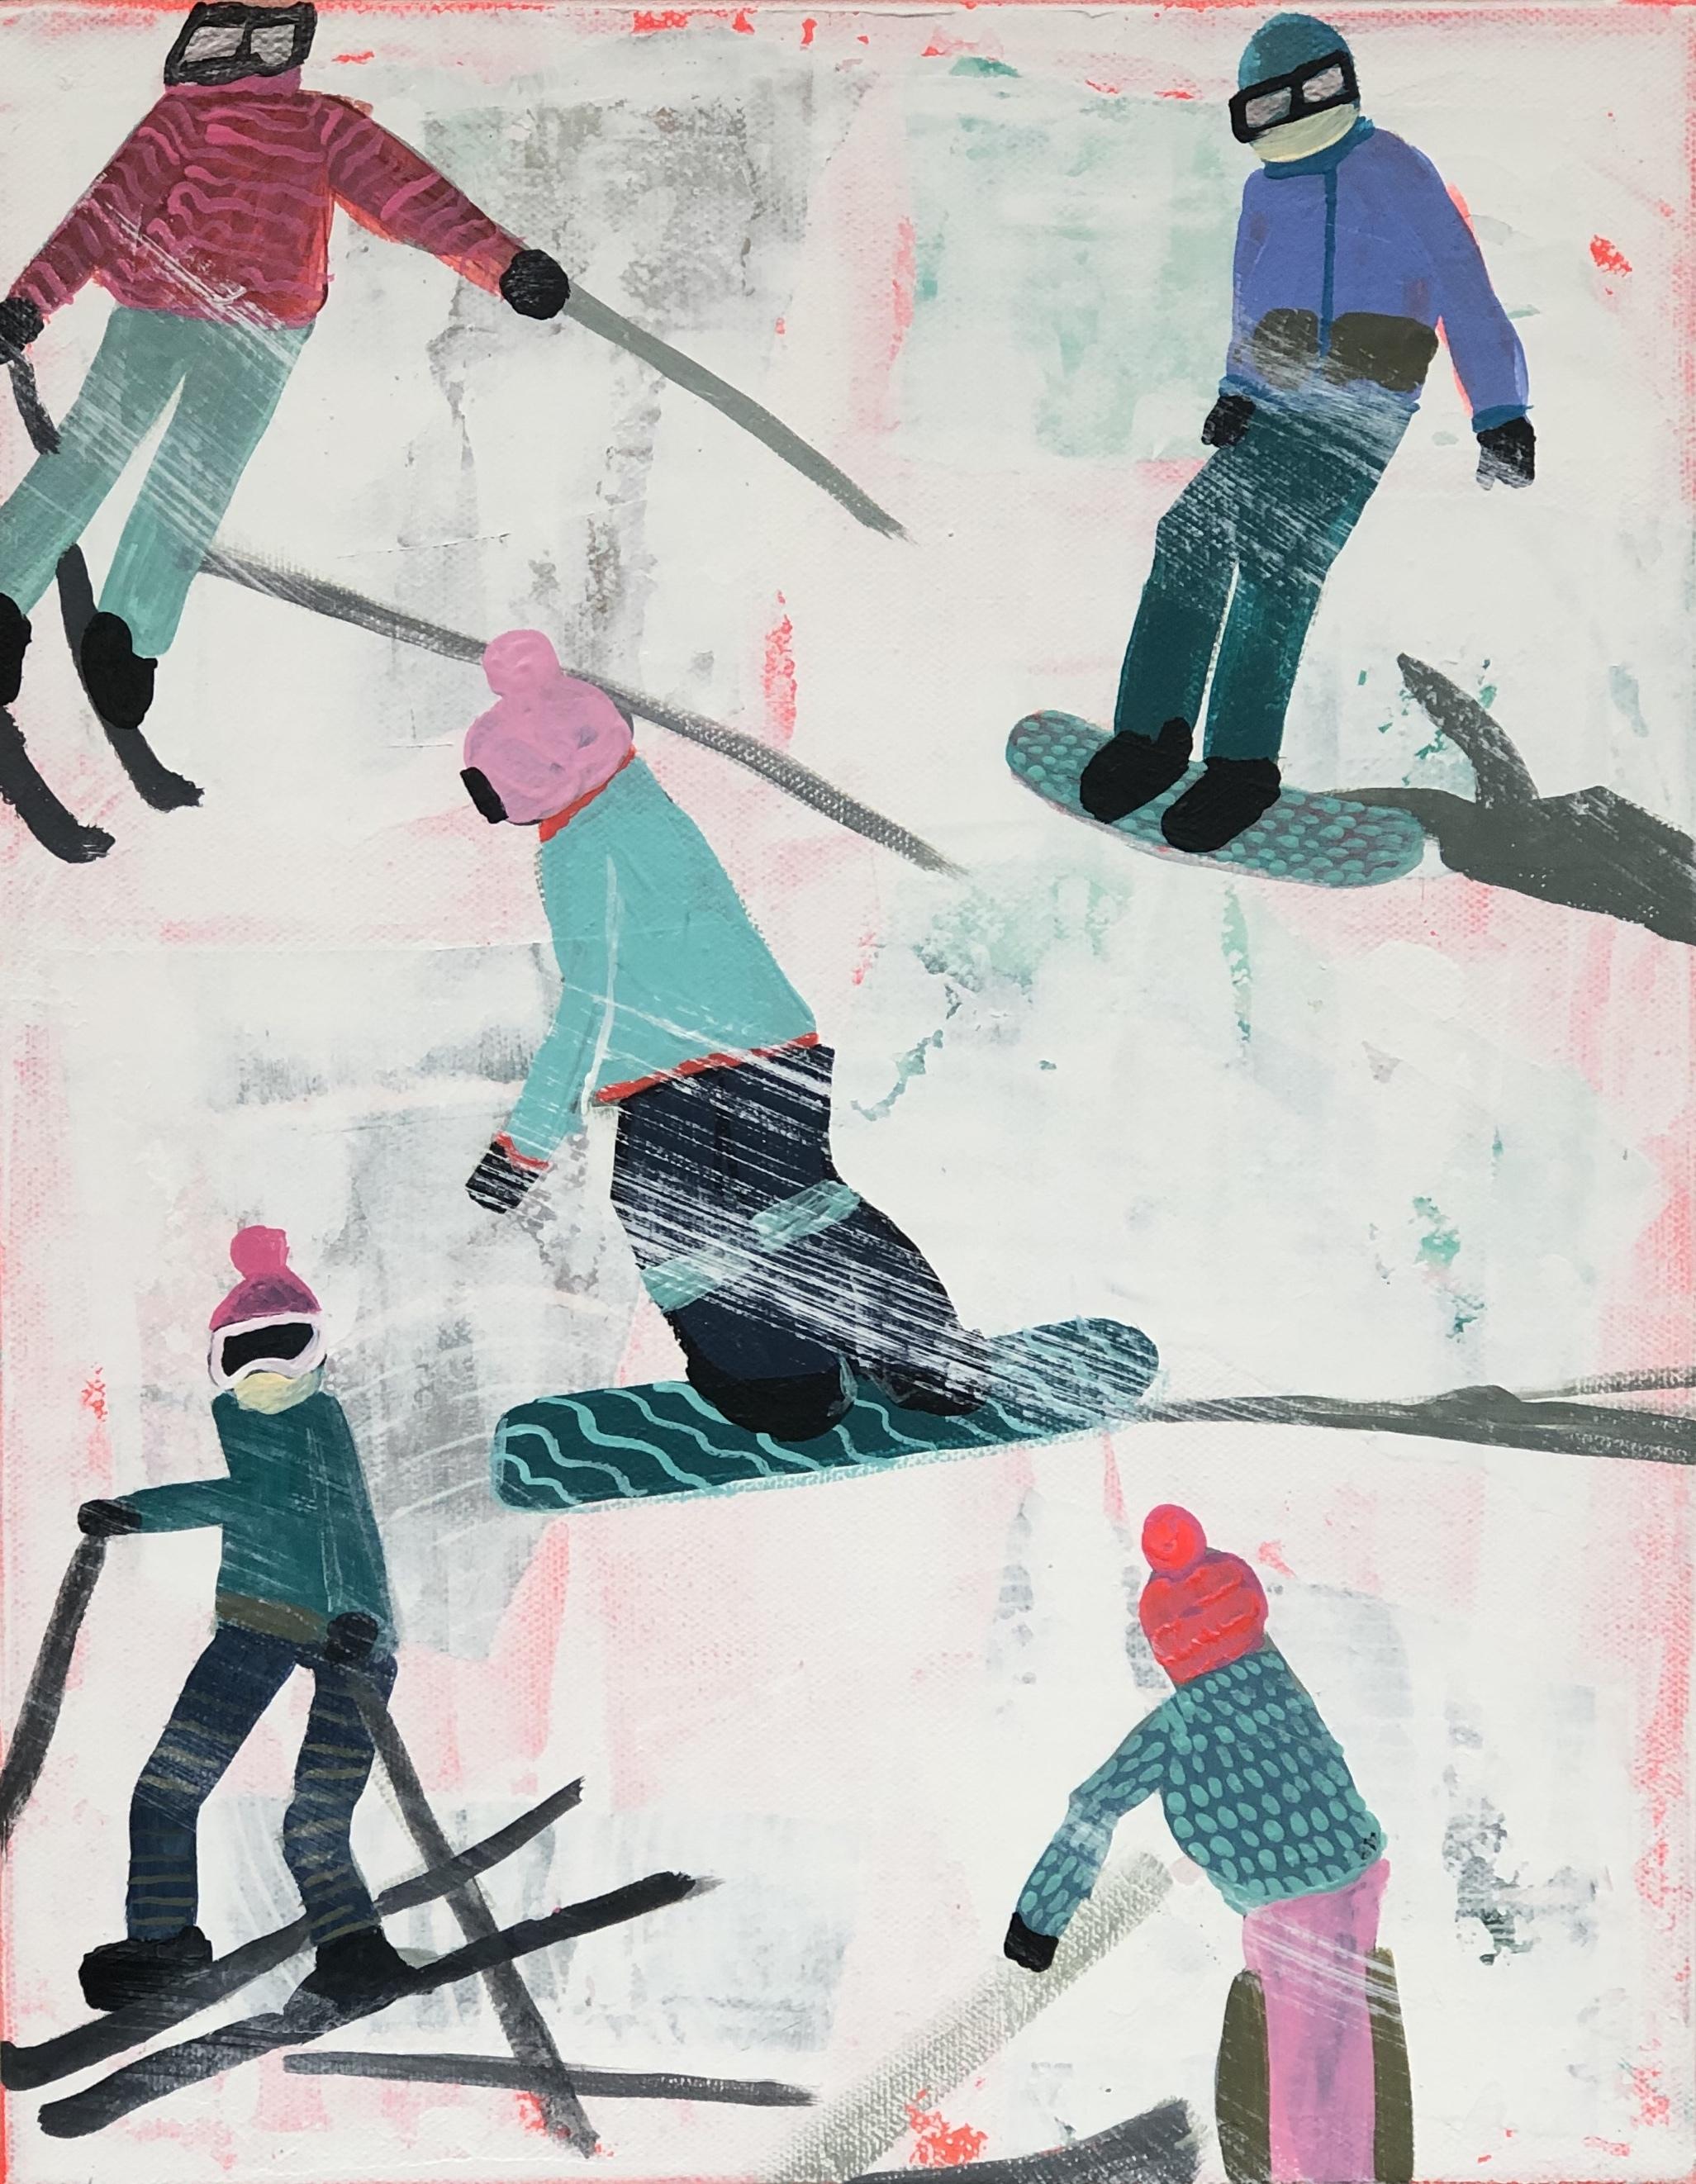 Slope Party No. 1 Print